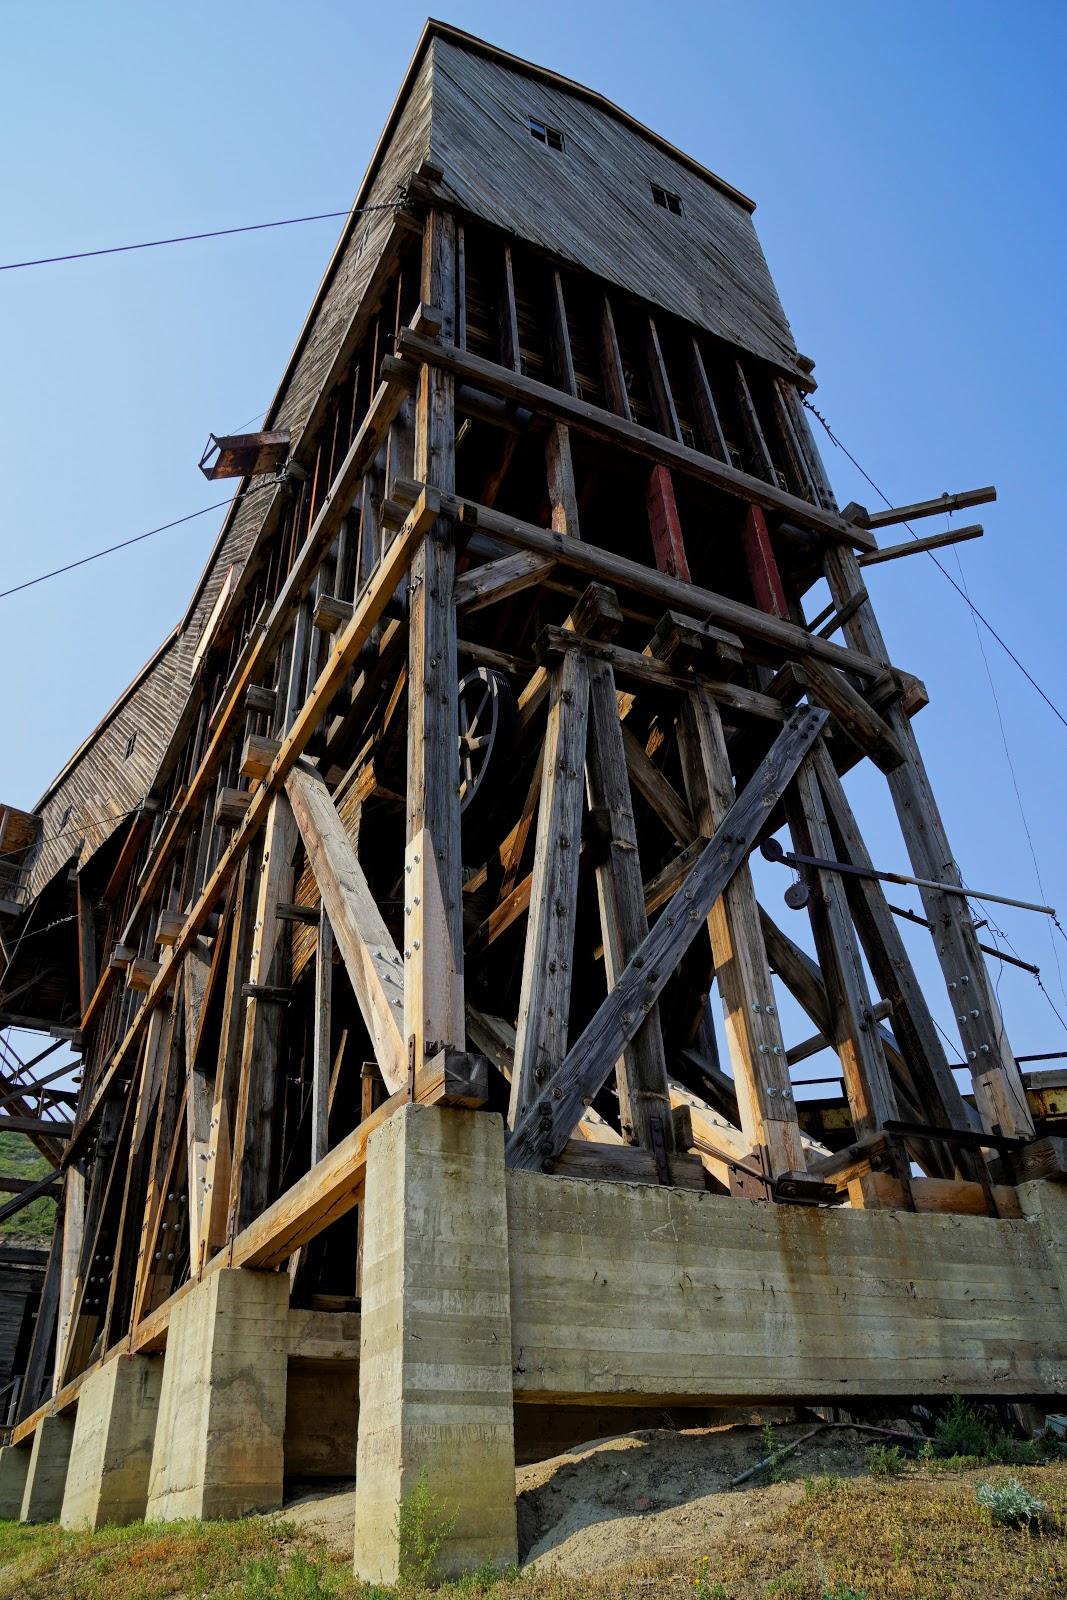 Canada's last tipple - at Atlas Coal Mine National Historic Site